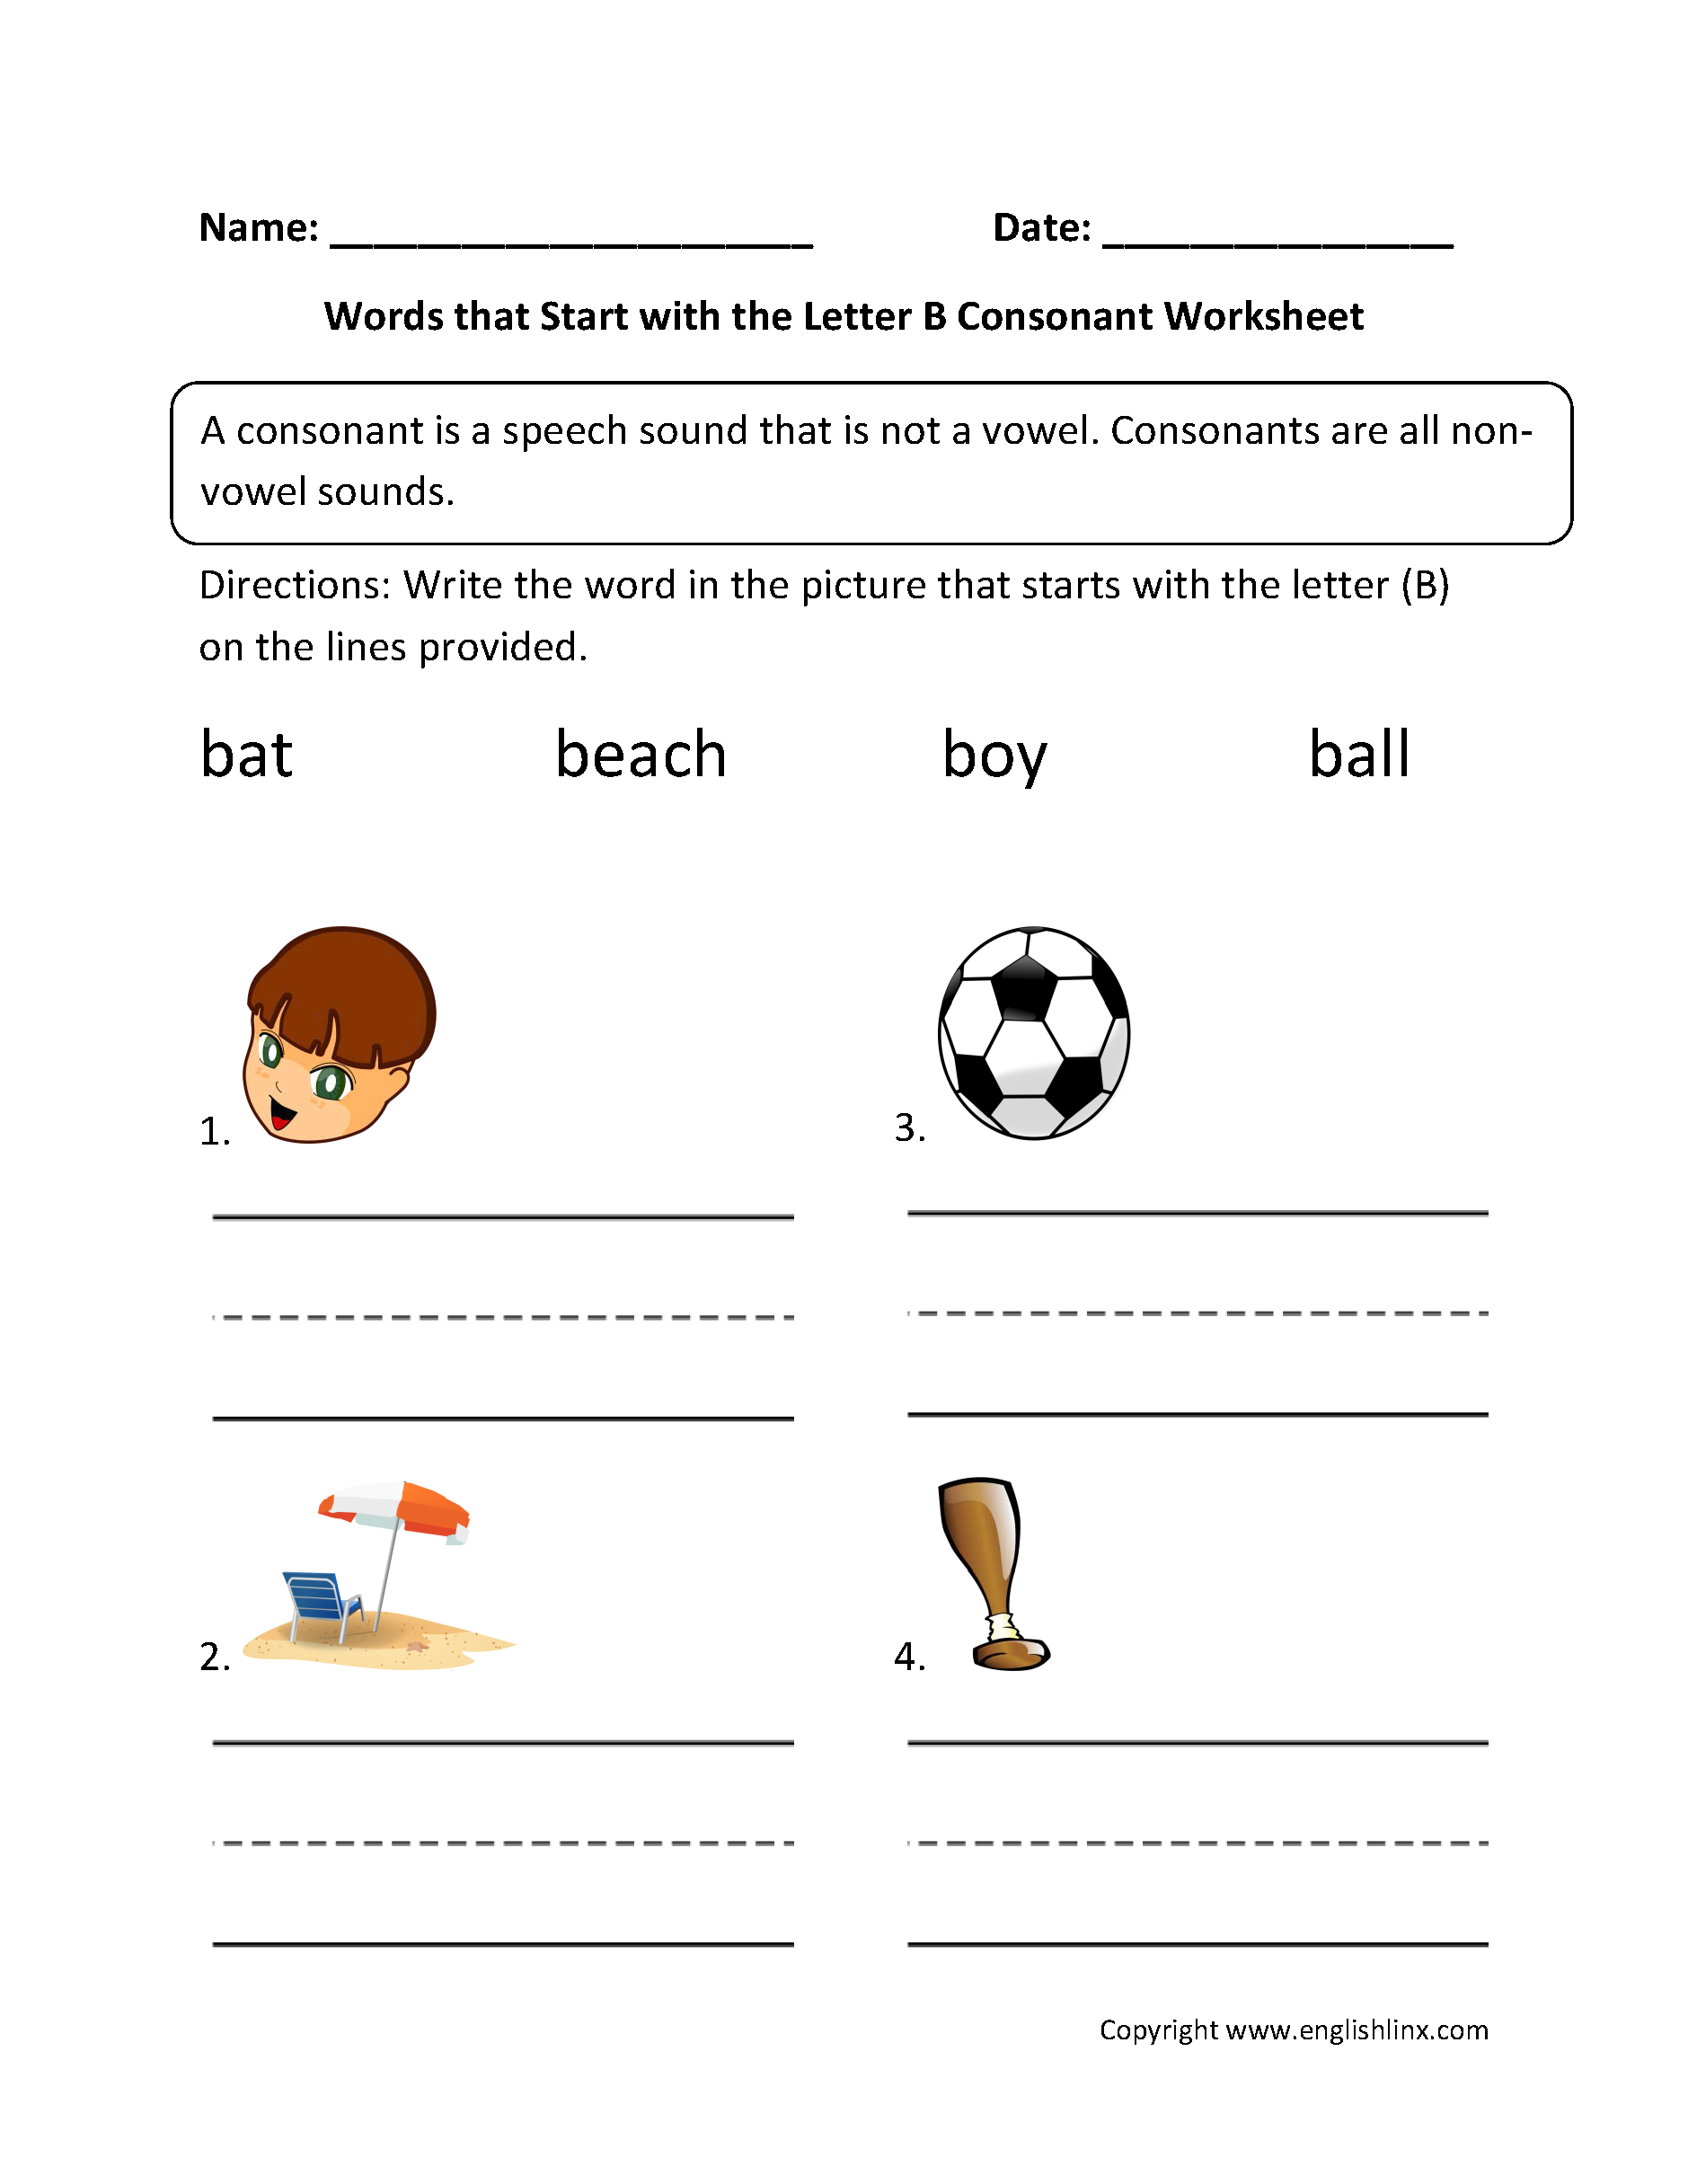 worksheet Consonant Digraph Worksheets For Second Grade words start letter b consonant worksheets englishlinx com board worksheets